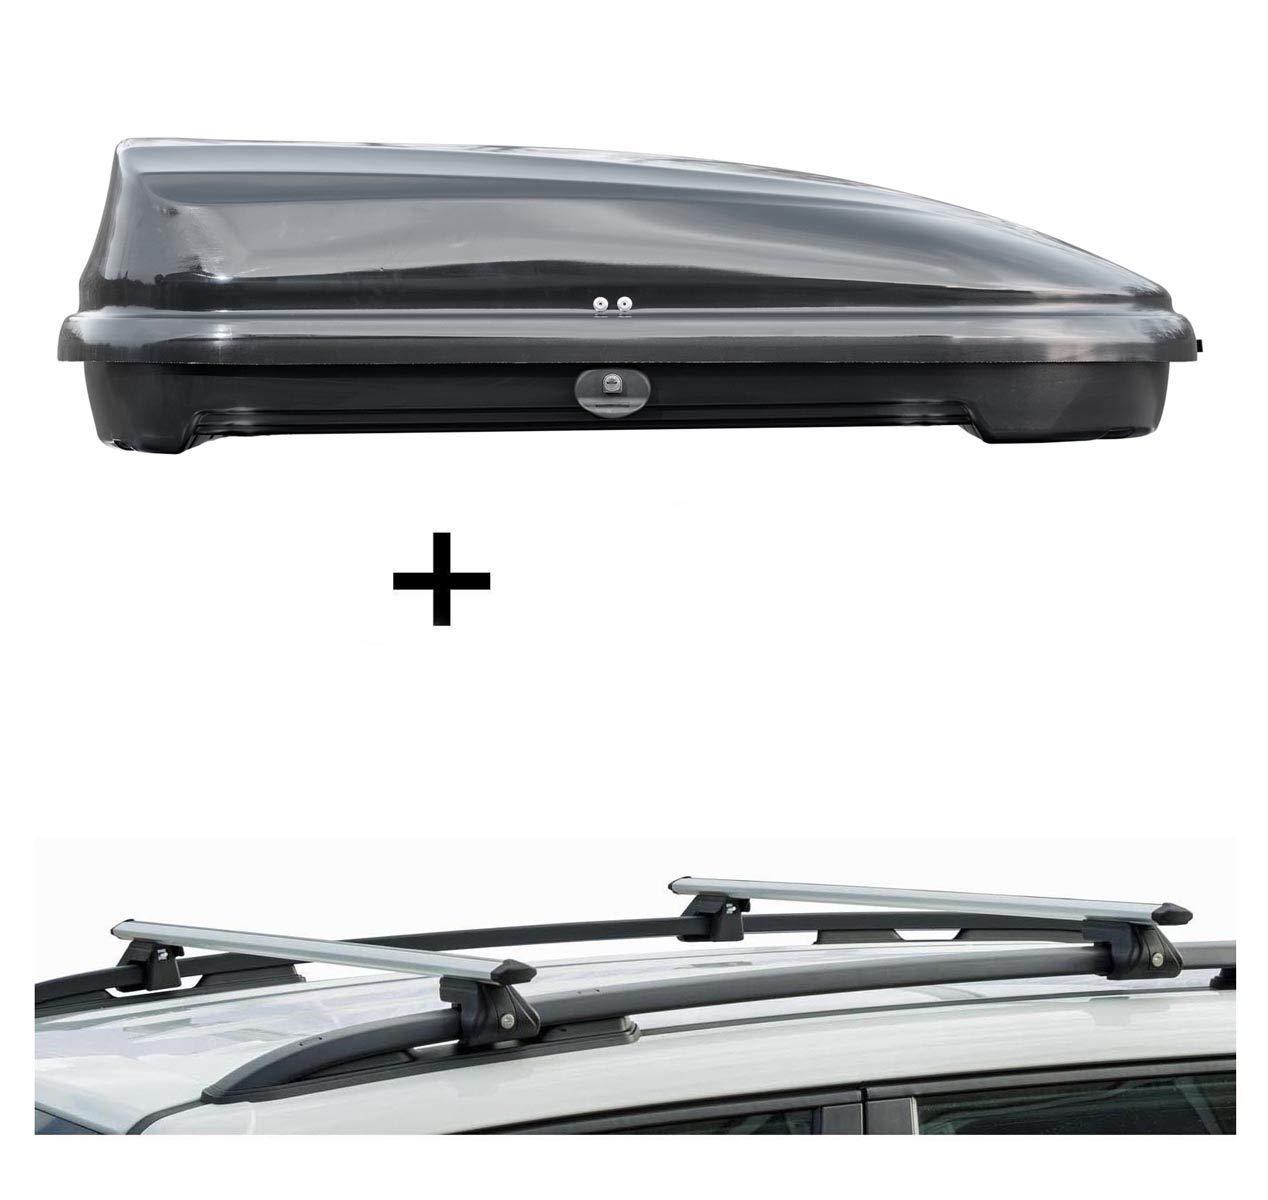 5 T/ürer ab 2013 Dachbox VDPFL320 320Ltr schwarz gl/änzend Dachtr/äger CRV120 kompatibel mit Dacia Sandero Stepway II